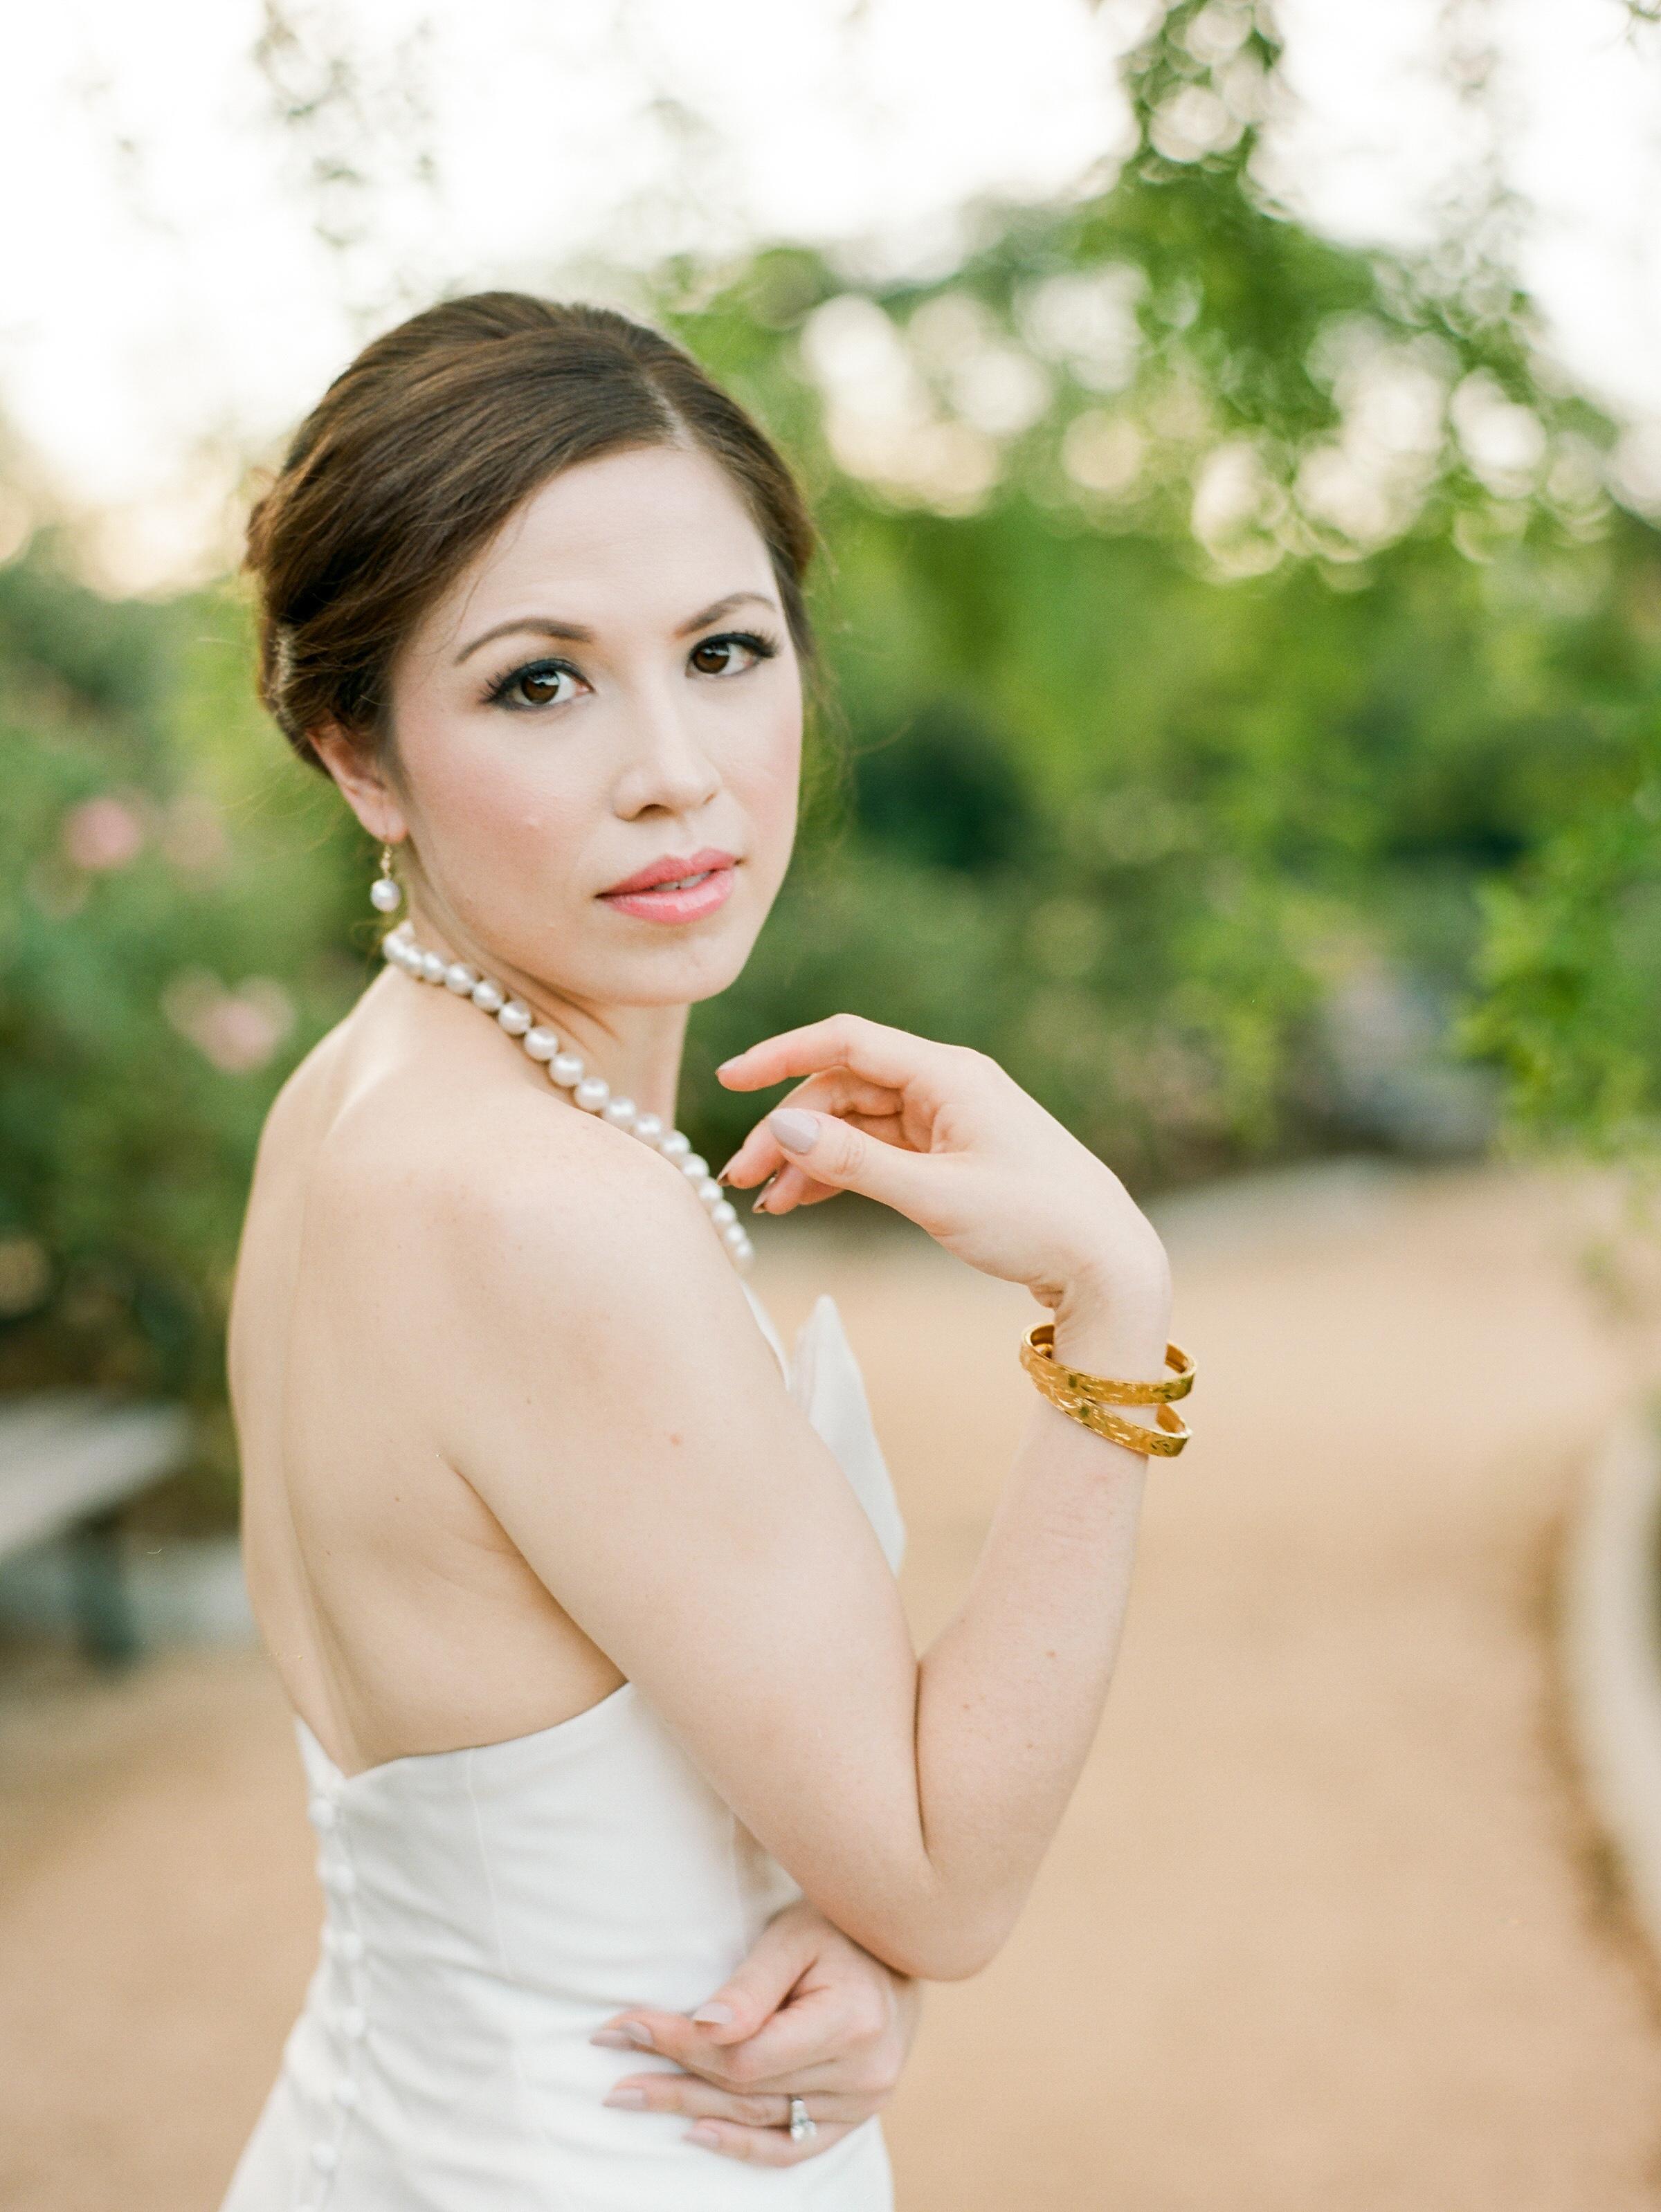 mcgovern-centennial-gardens-wedding-houston-wedding-photographer-bridals-film-austin-wedding-photographer-5.jpg